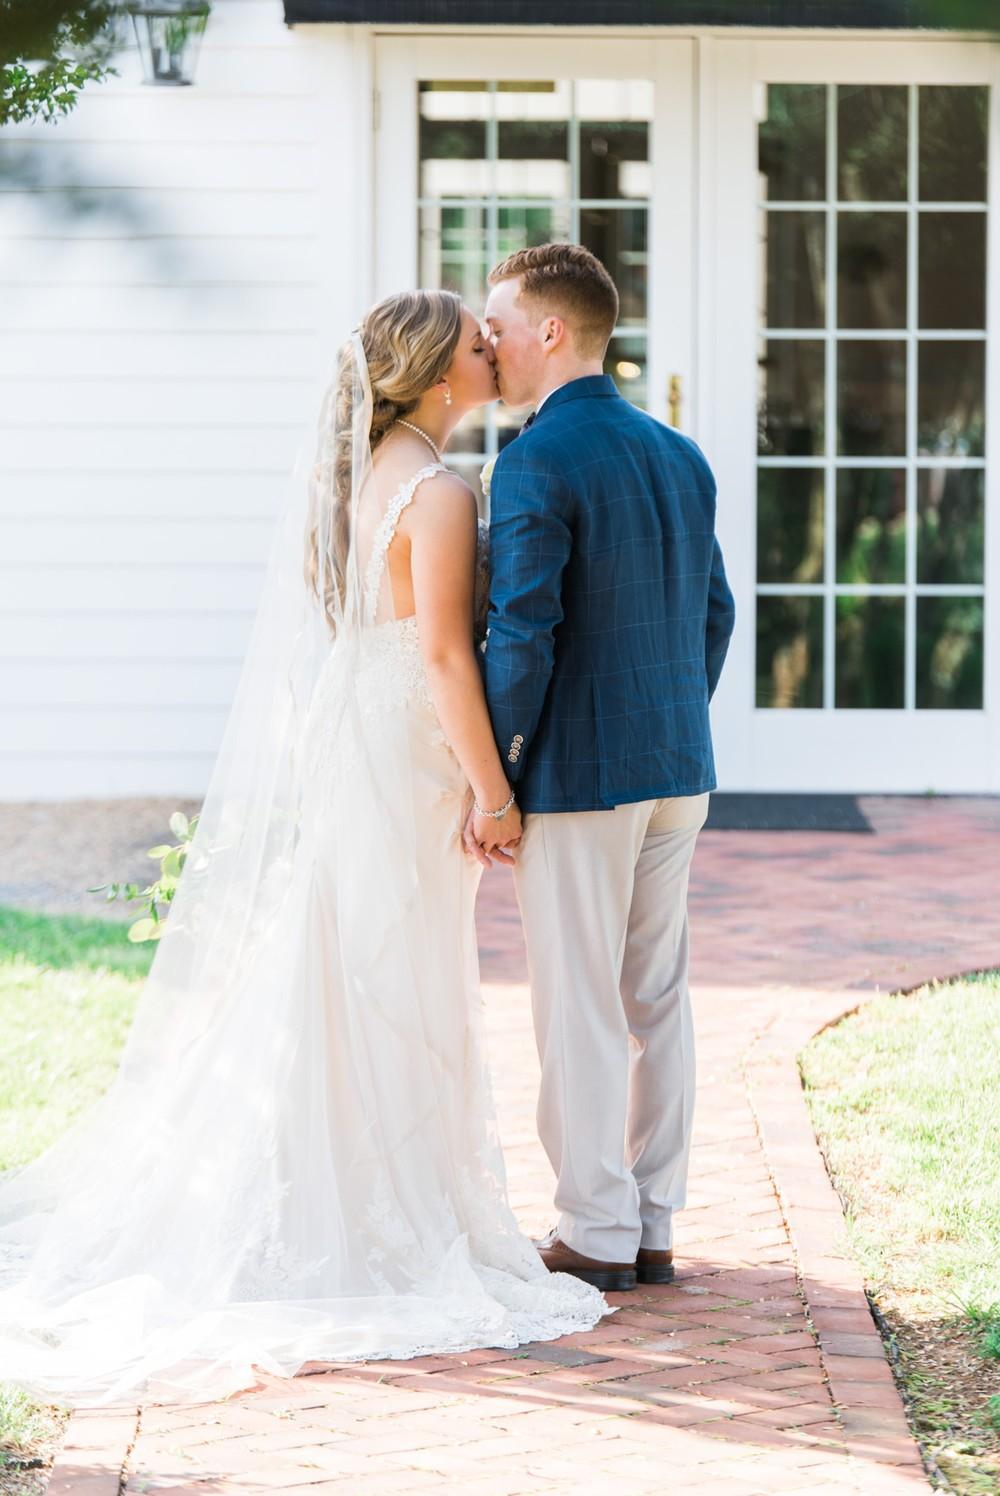 trivium_lynchburg_va_wedding_estate_wedding_photography_wedding_photographers (54).jpg